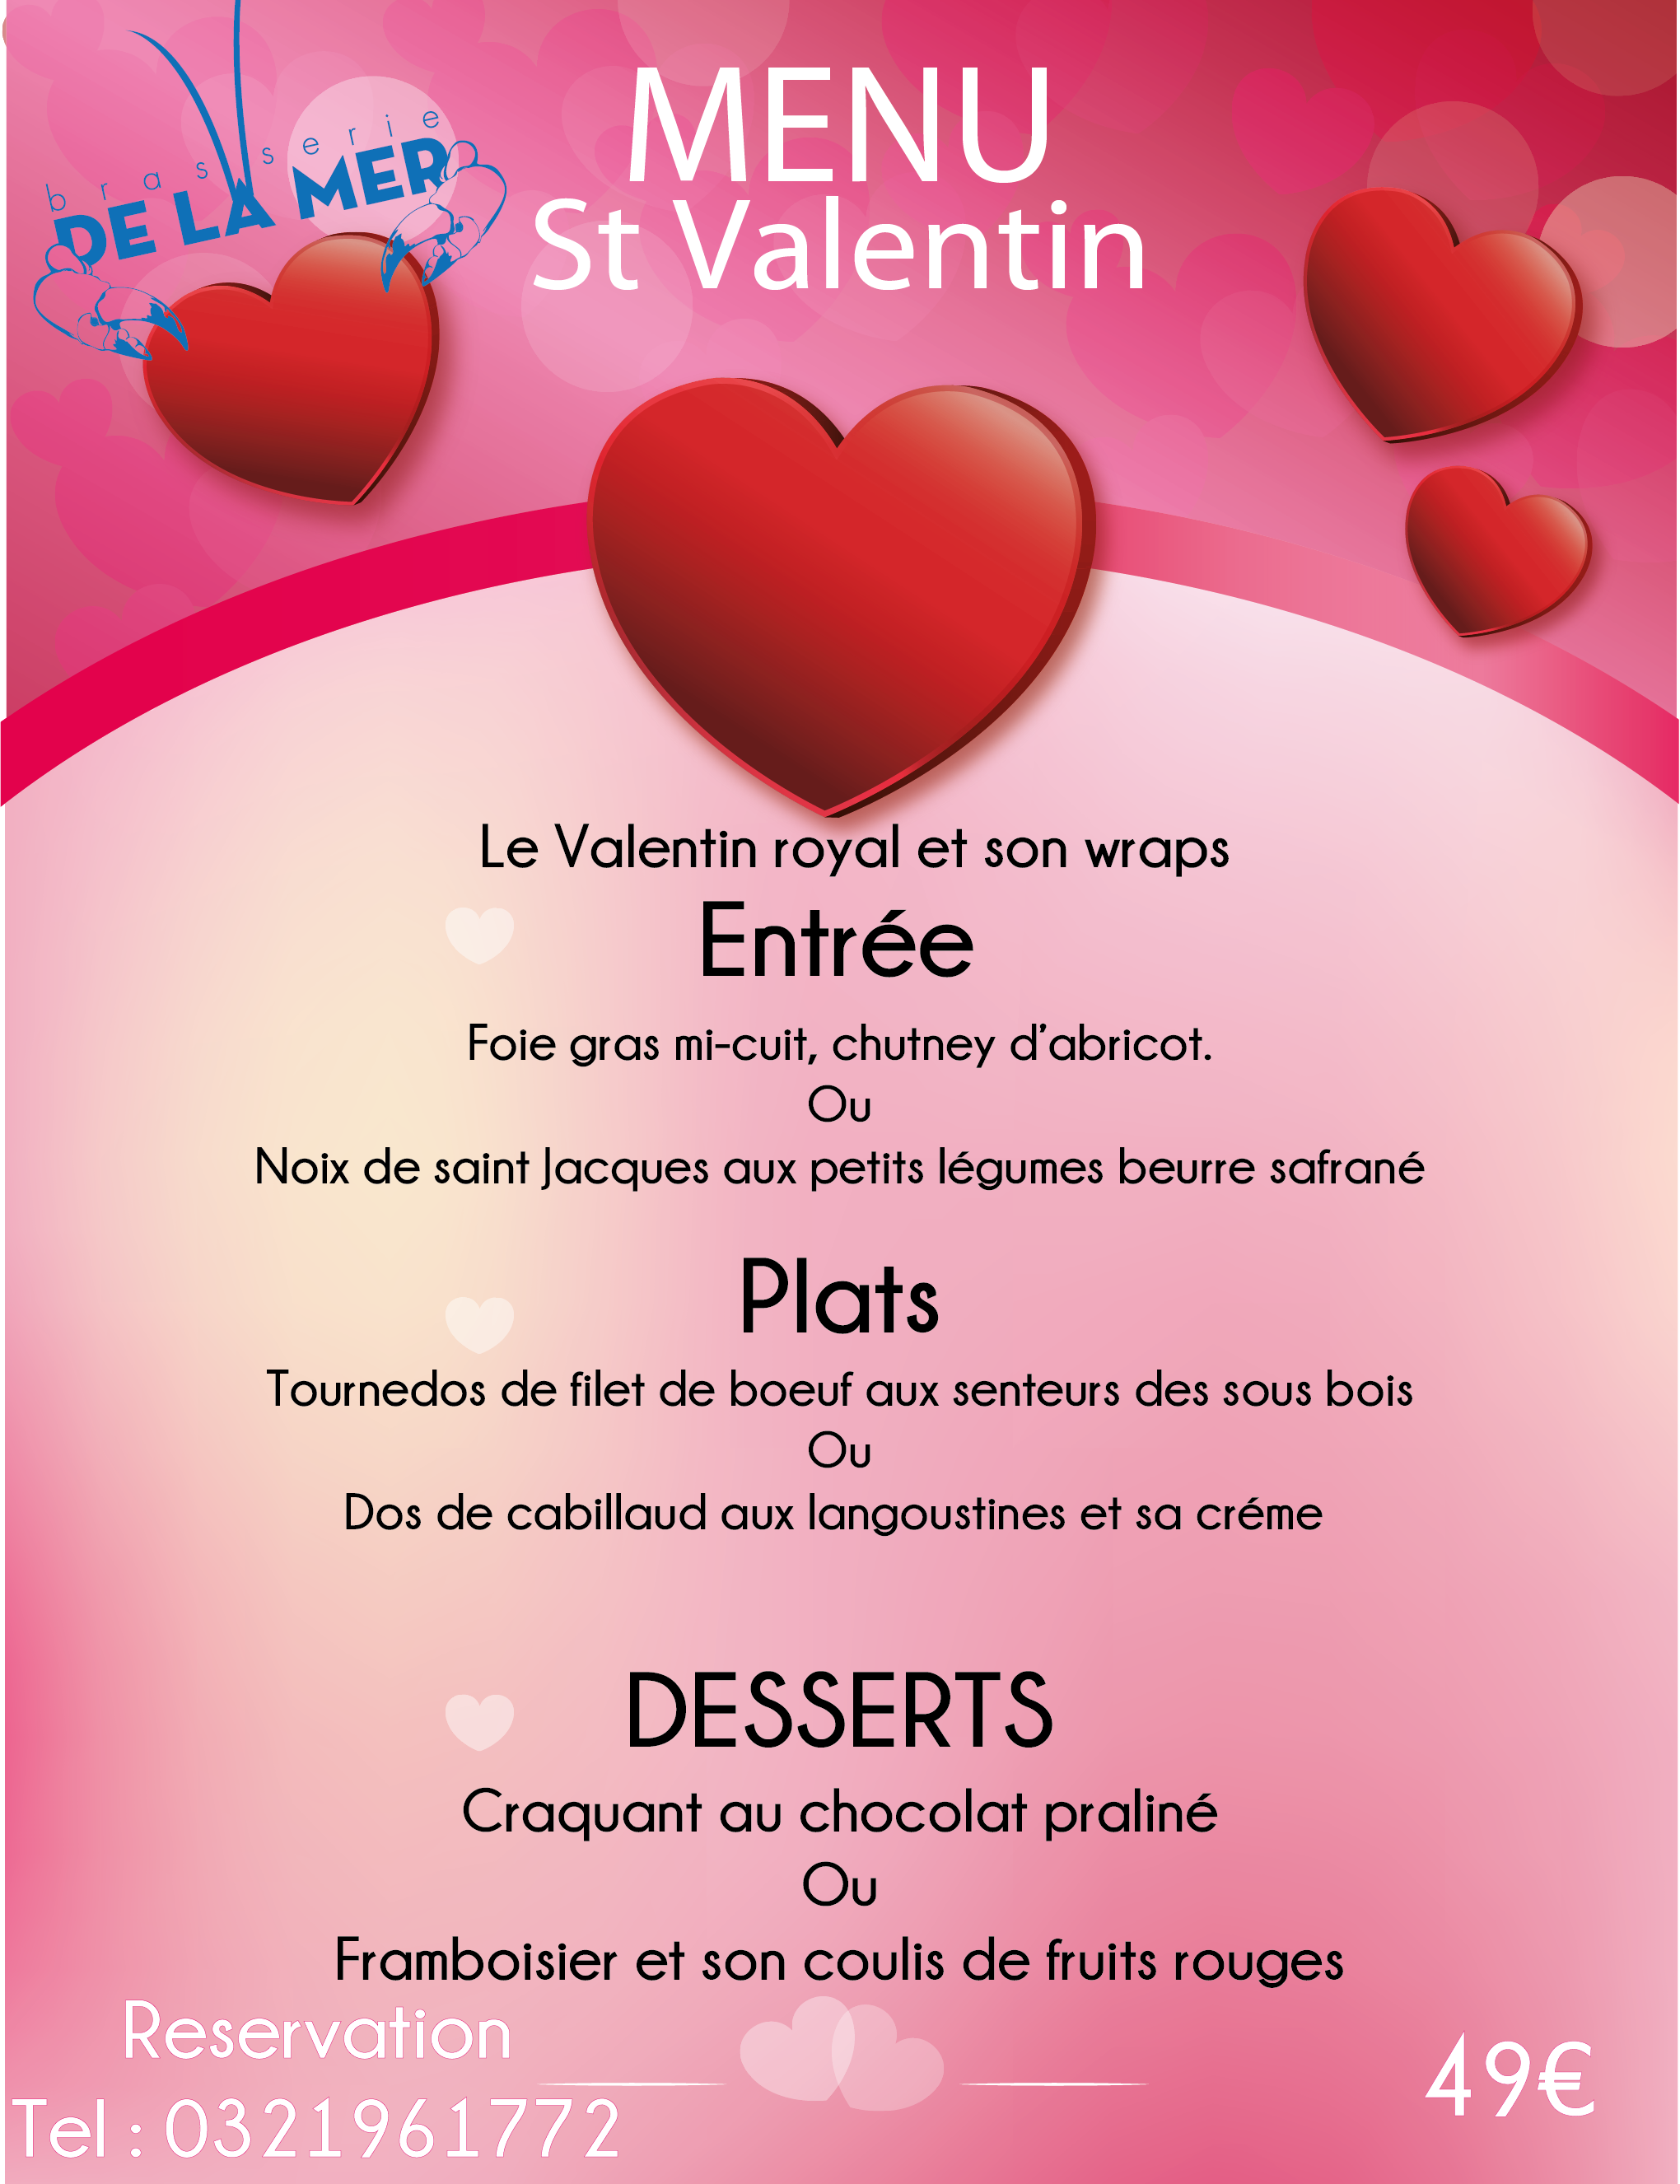 menu-de-st-valentin-2019-01